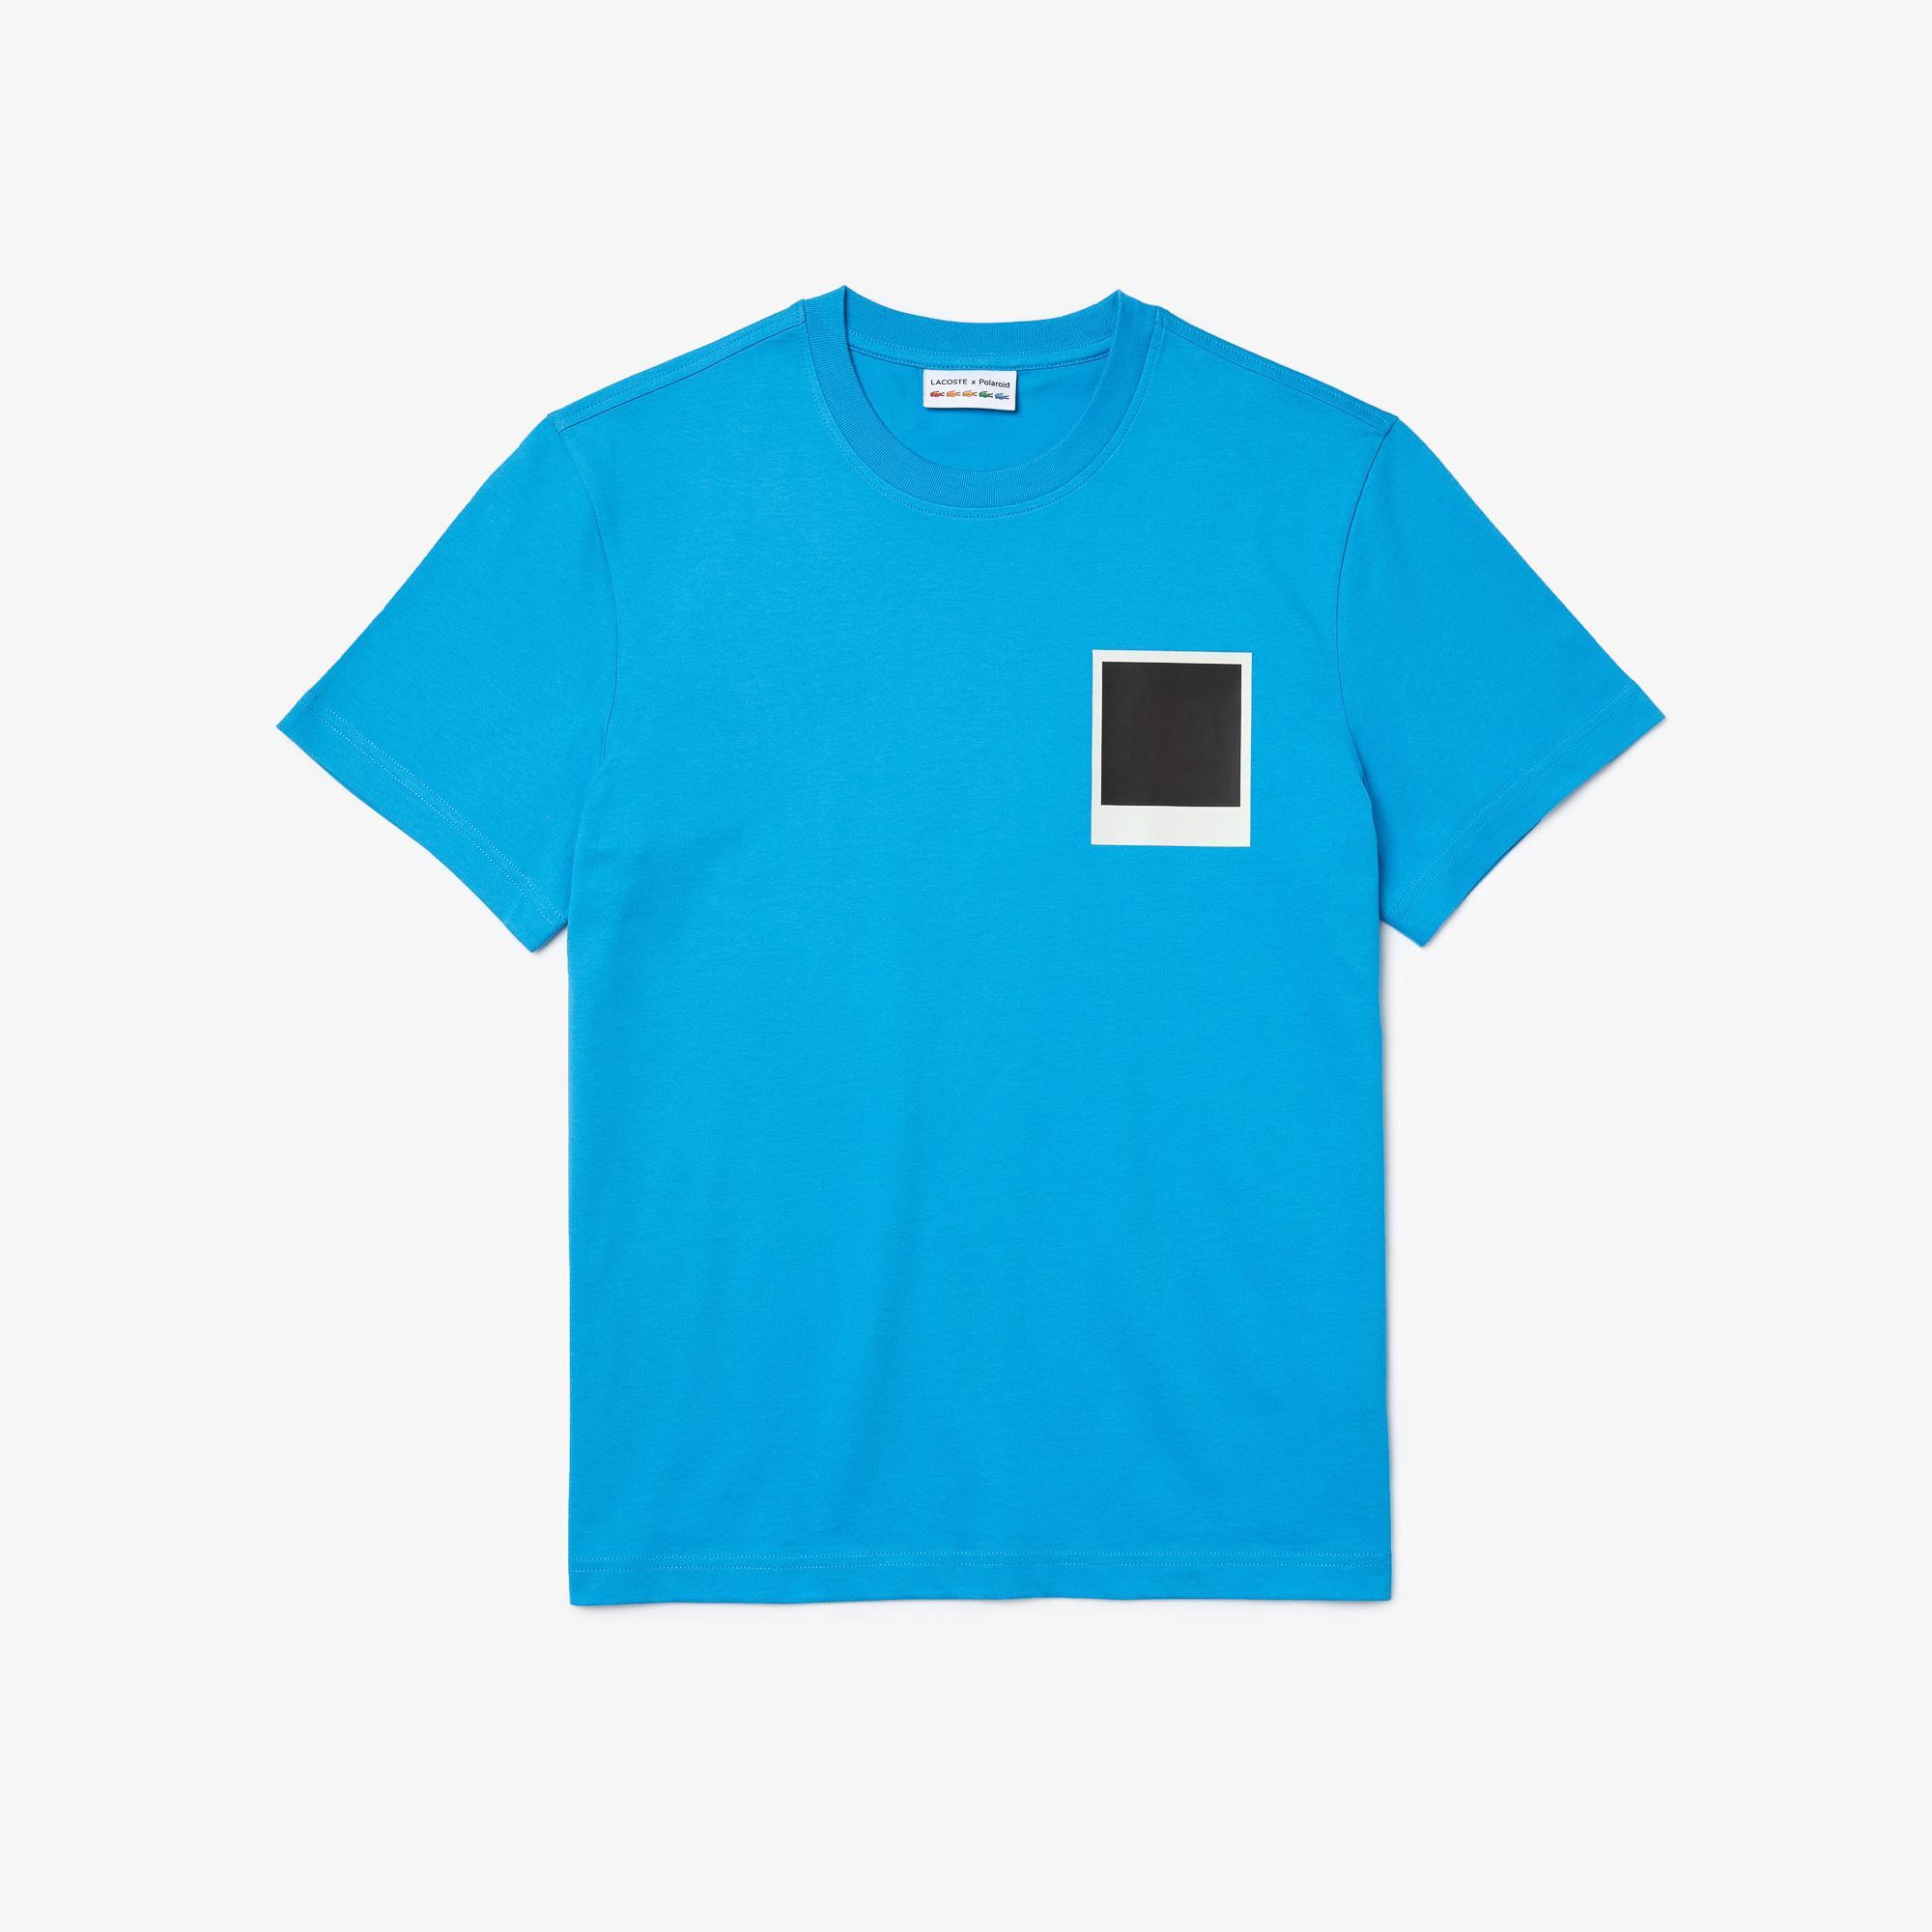 Lacoste X Polaroid Erkek Regular Fit Bisiklet Yaka Baskılı Mavi T-Shirt